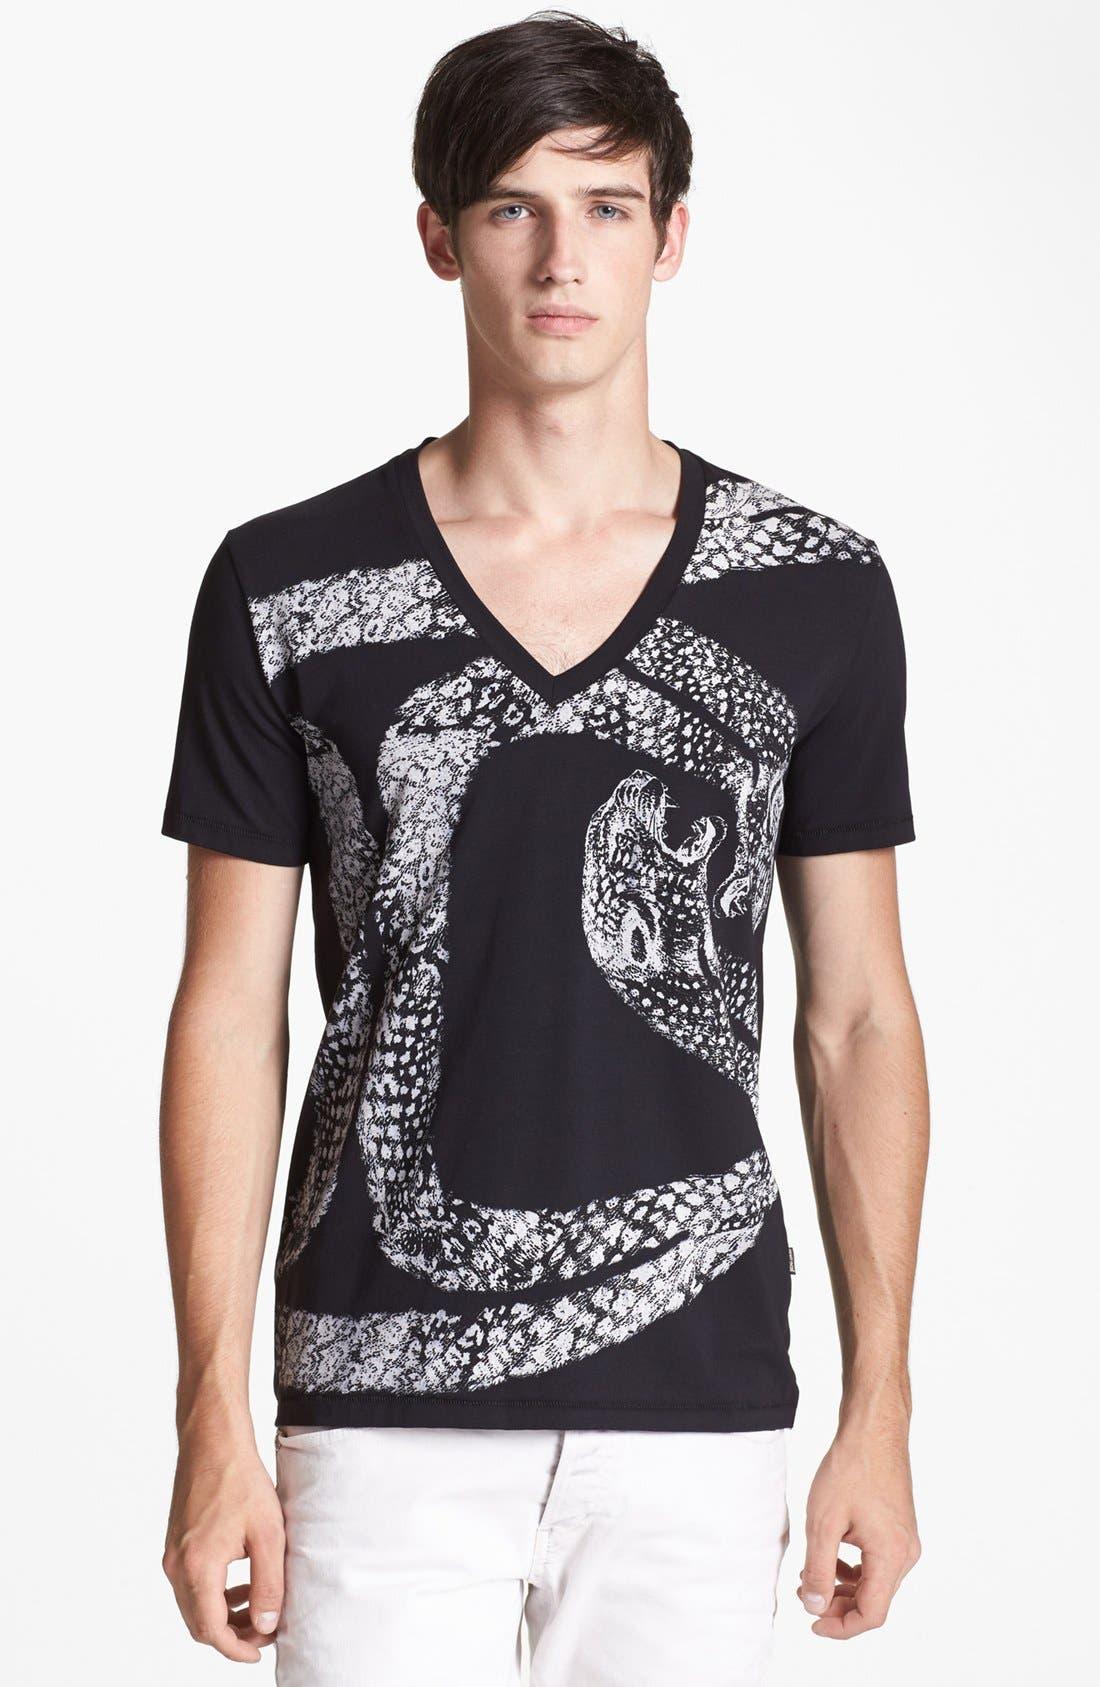 Just Cavalli 'Python' V-Neck T-Shirt